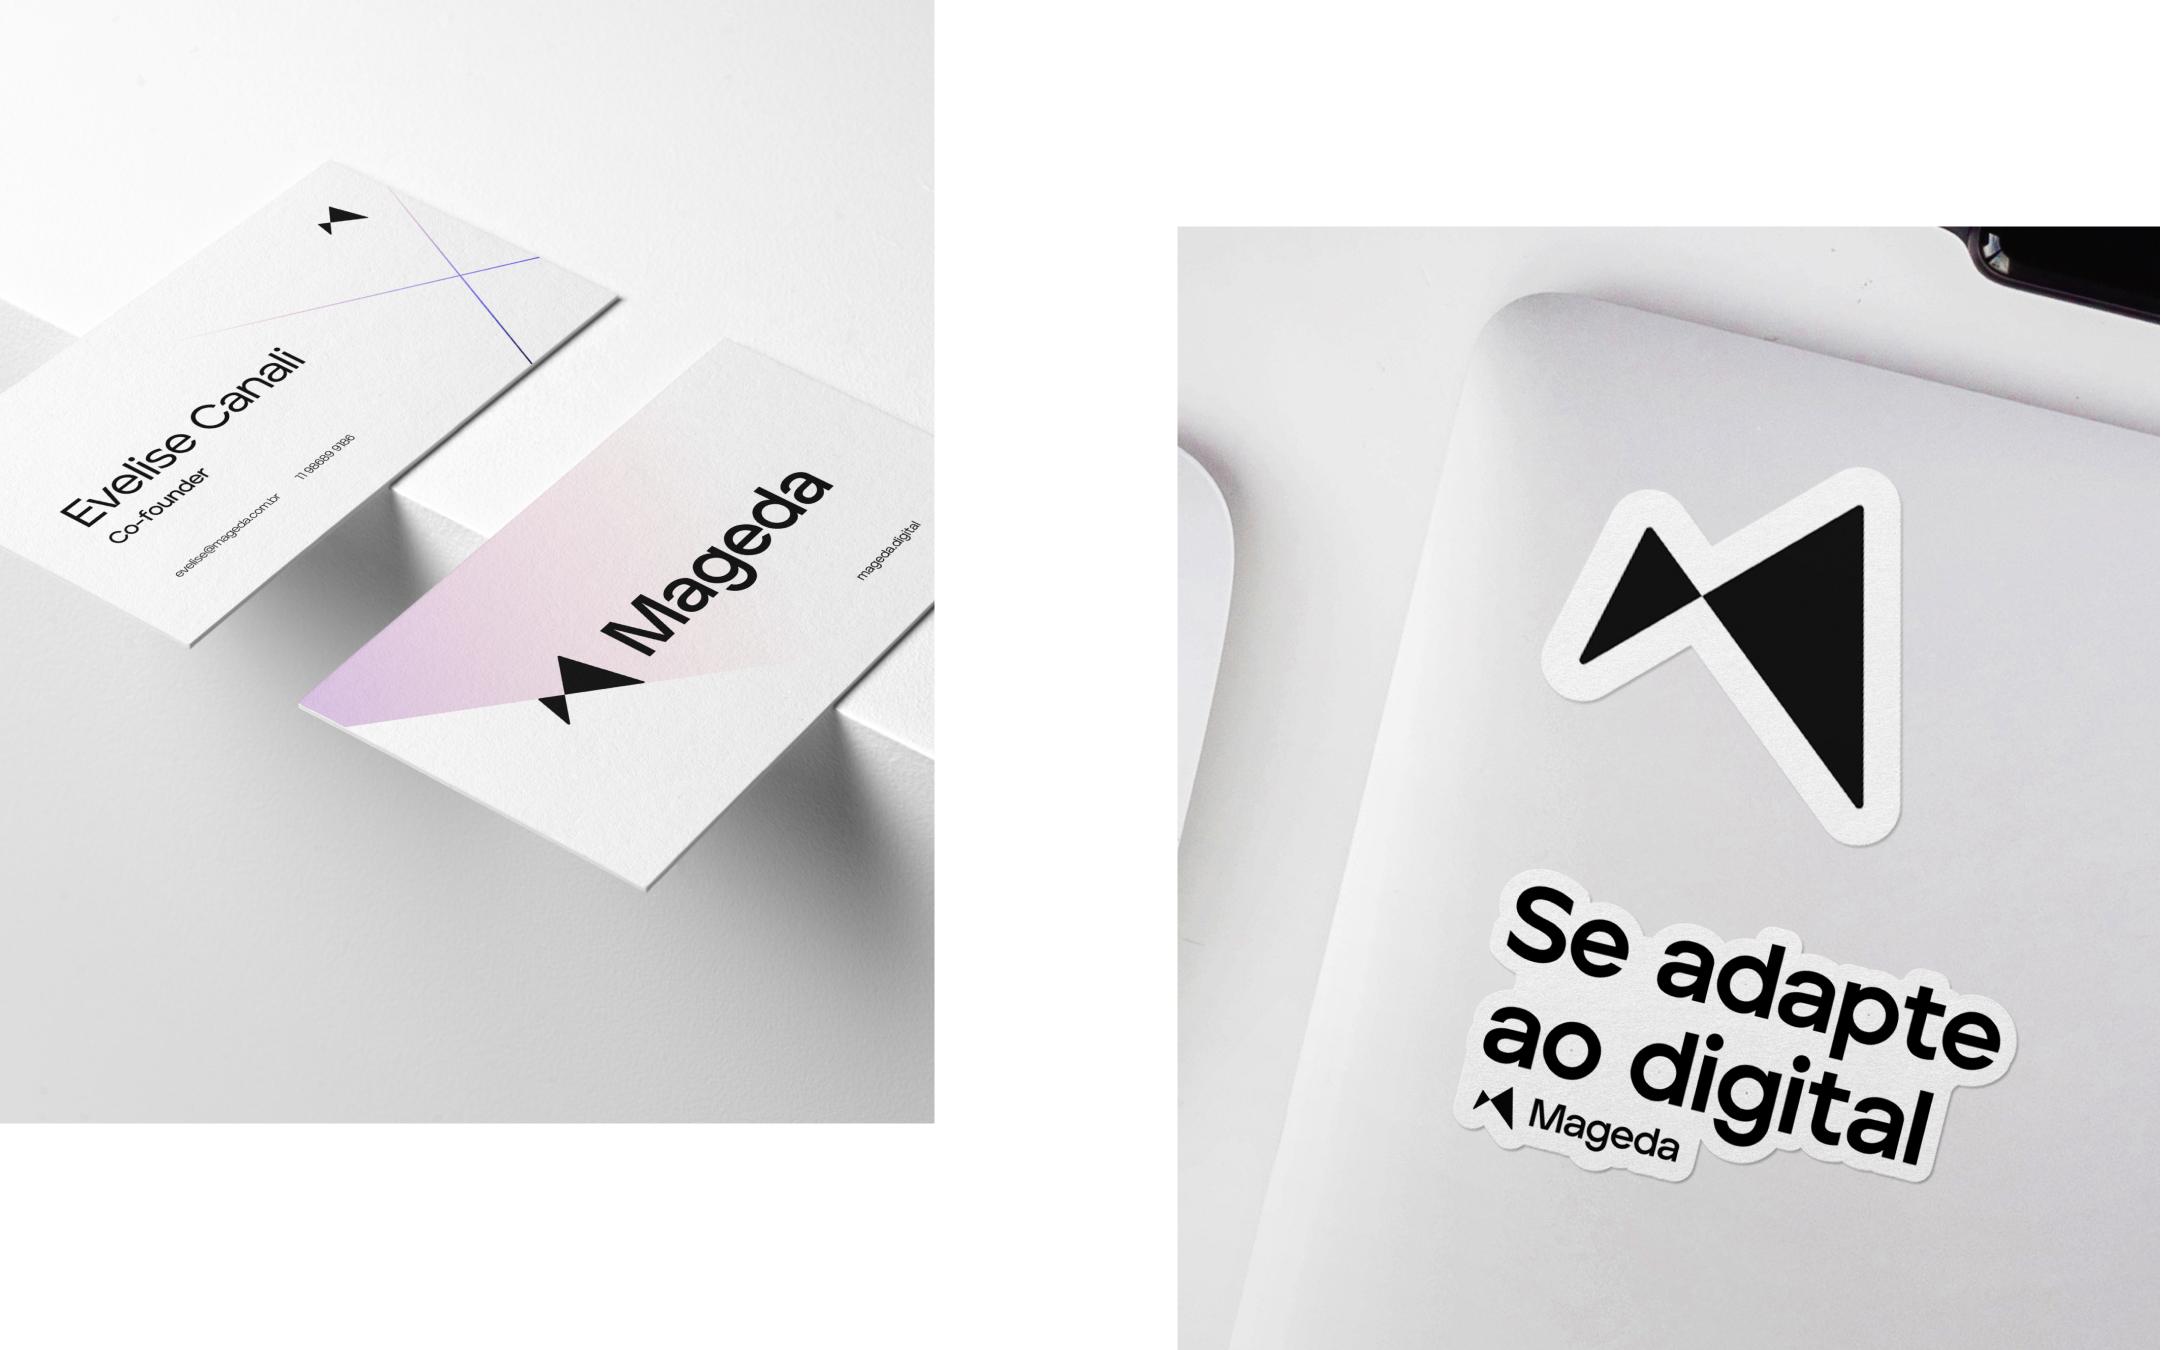 Mageda-Branding-brandupgrade-Design-Brand-Upgrade-Consulting-b2b2020-1